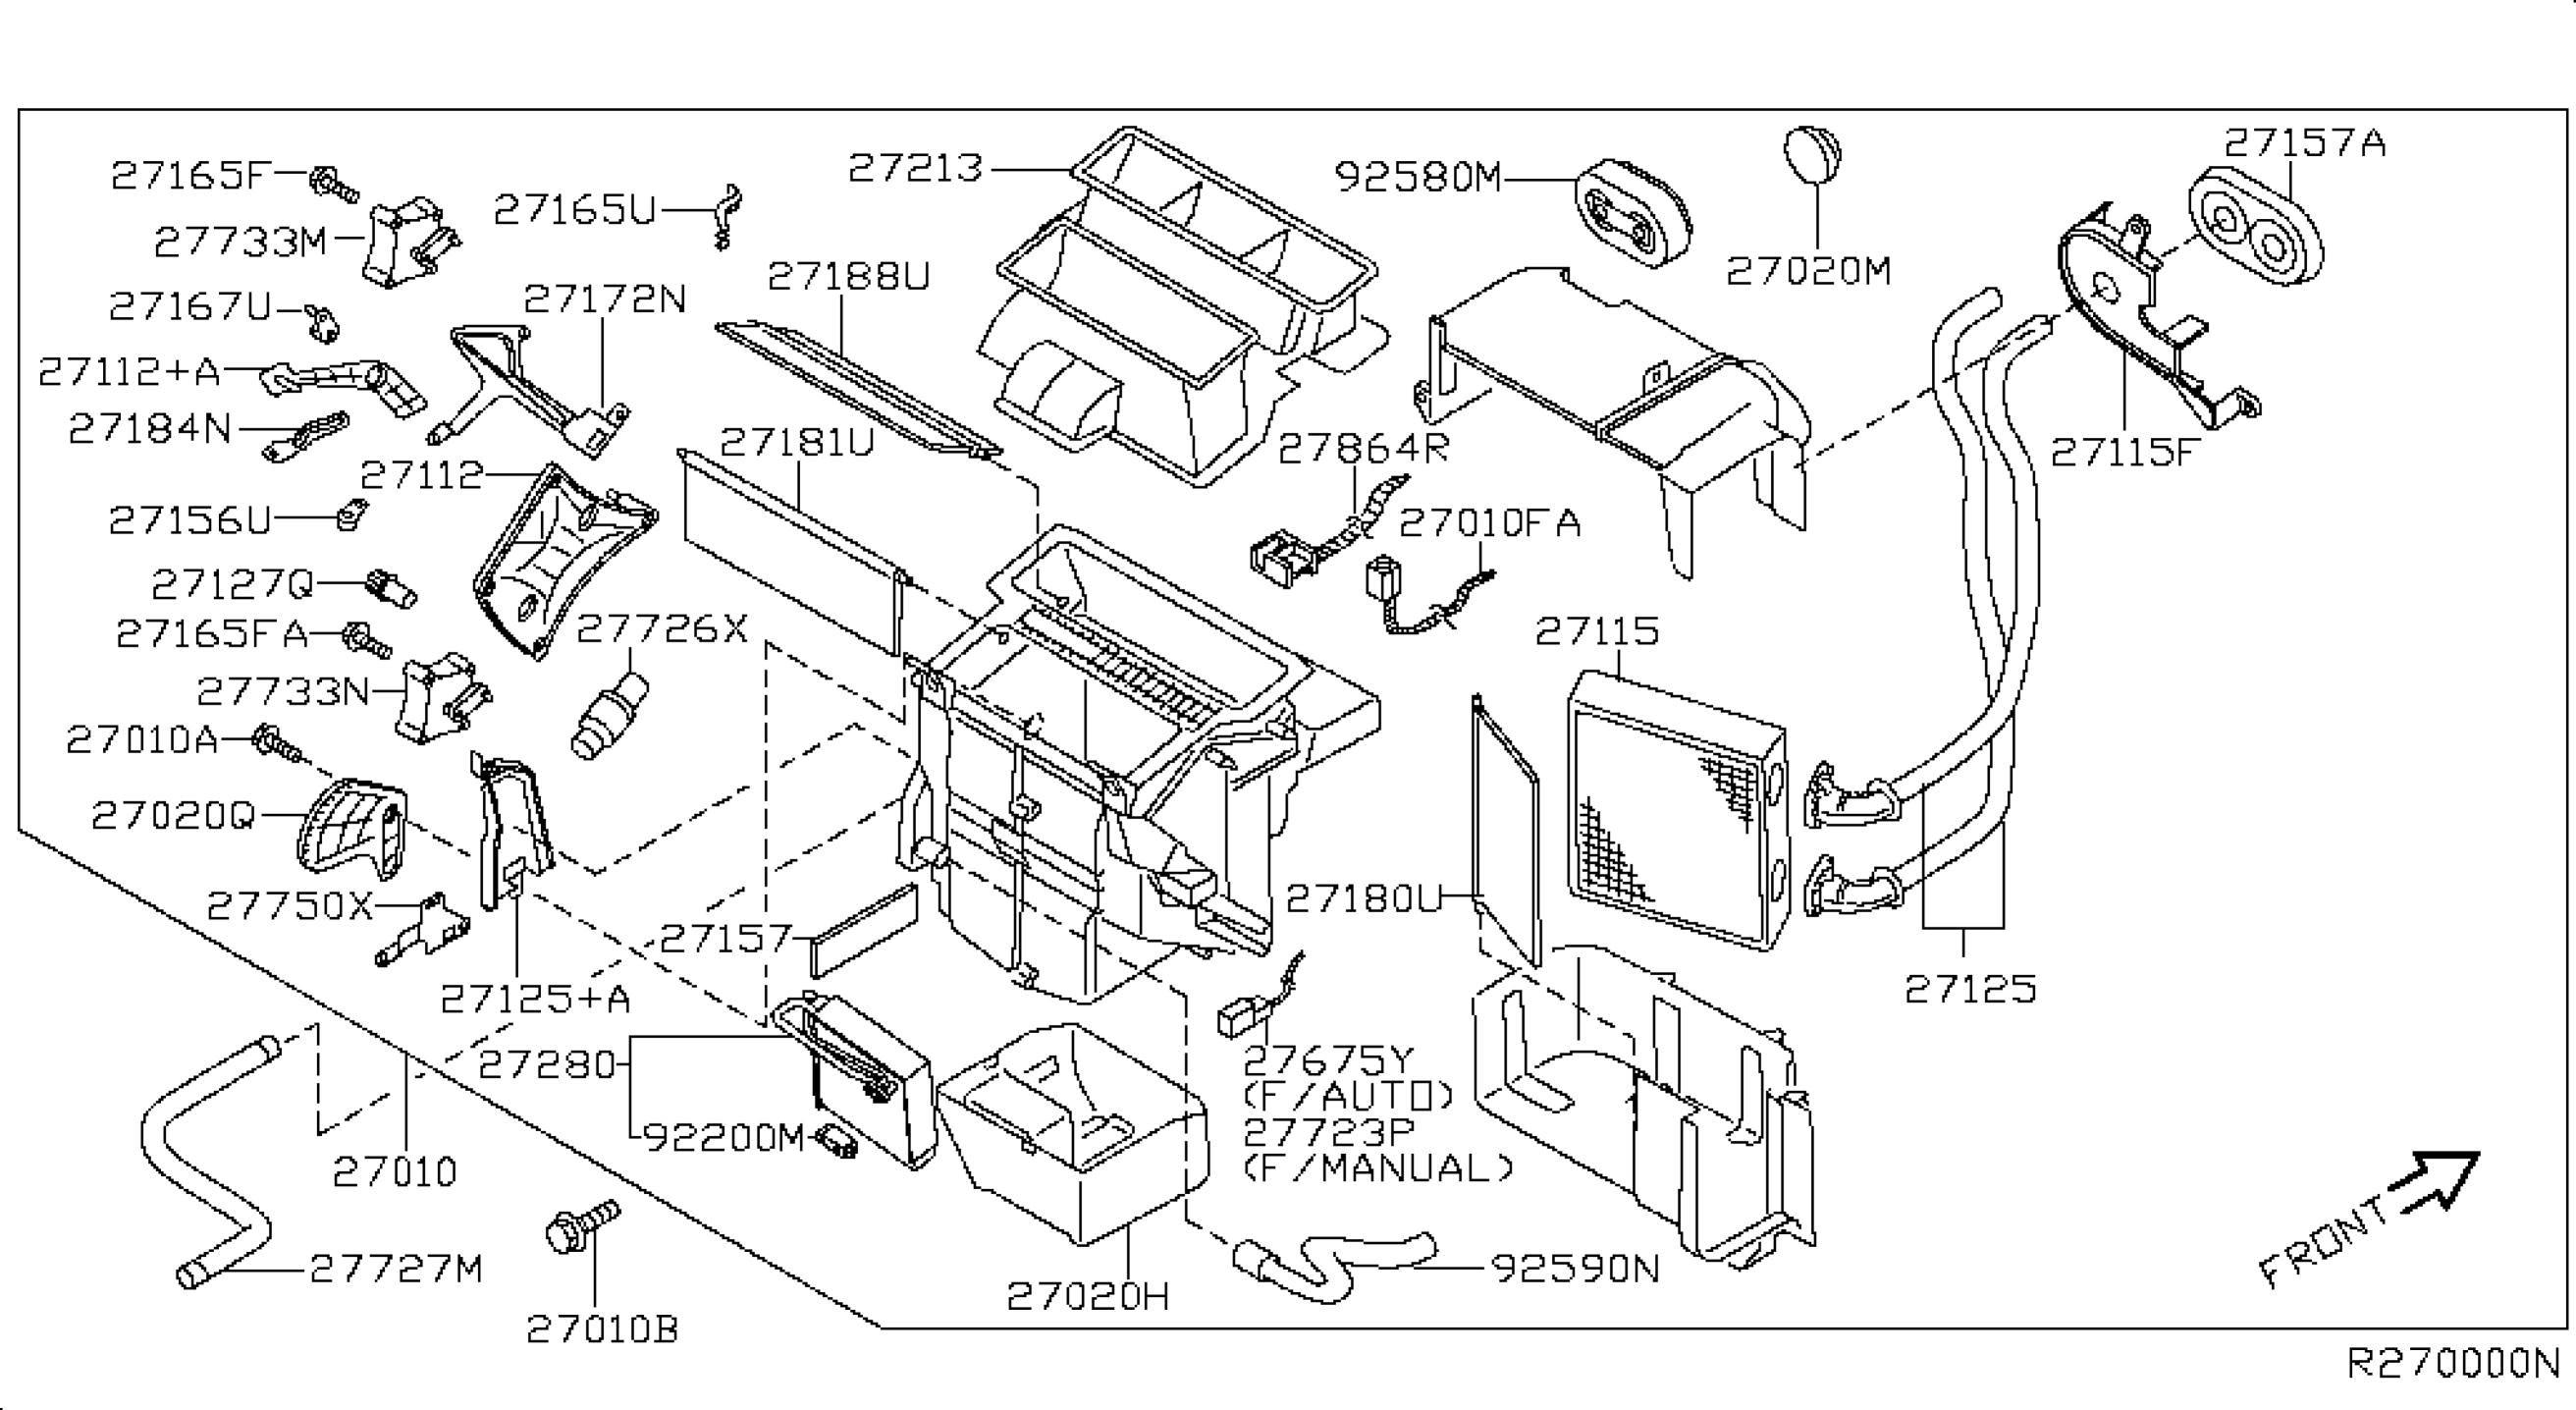 Nissan Sentra Parts Diagram